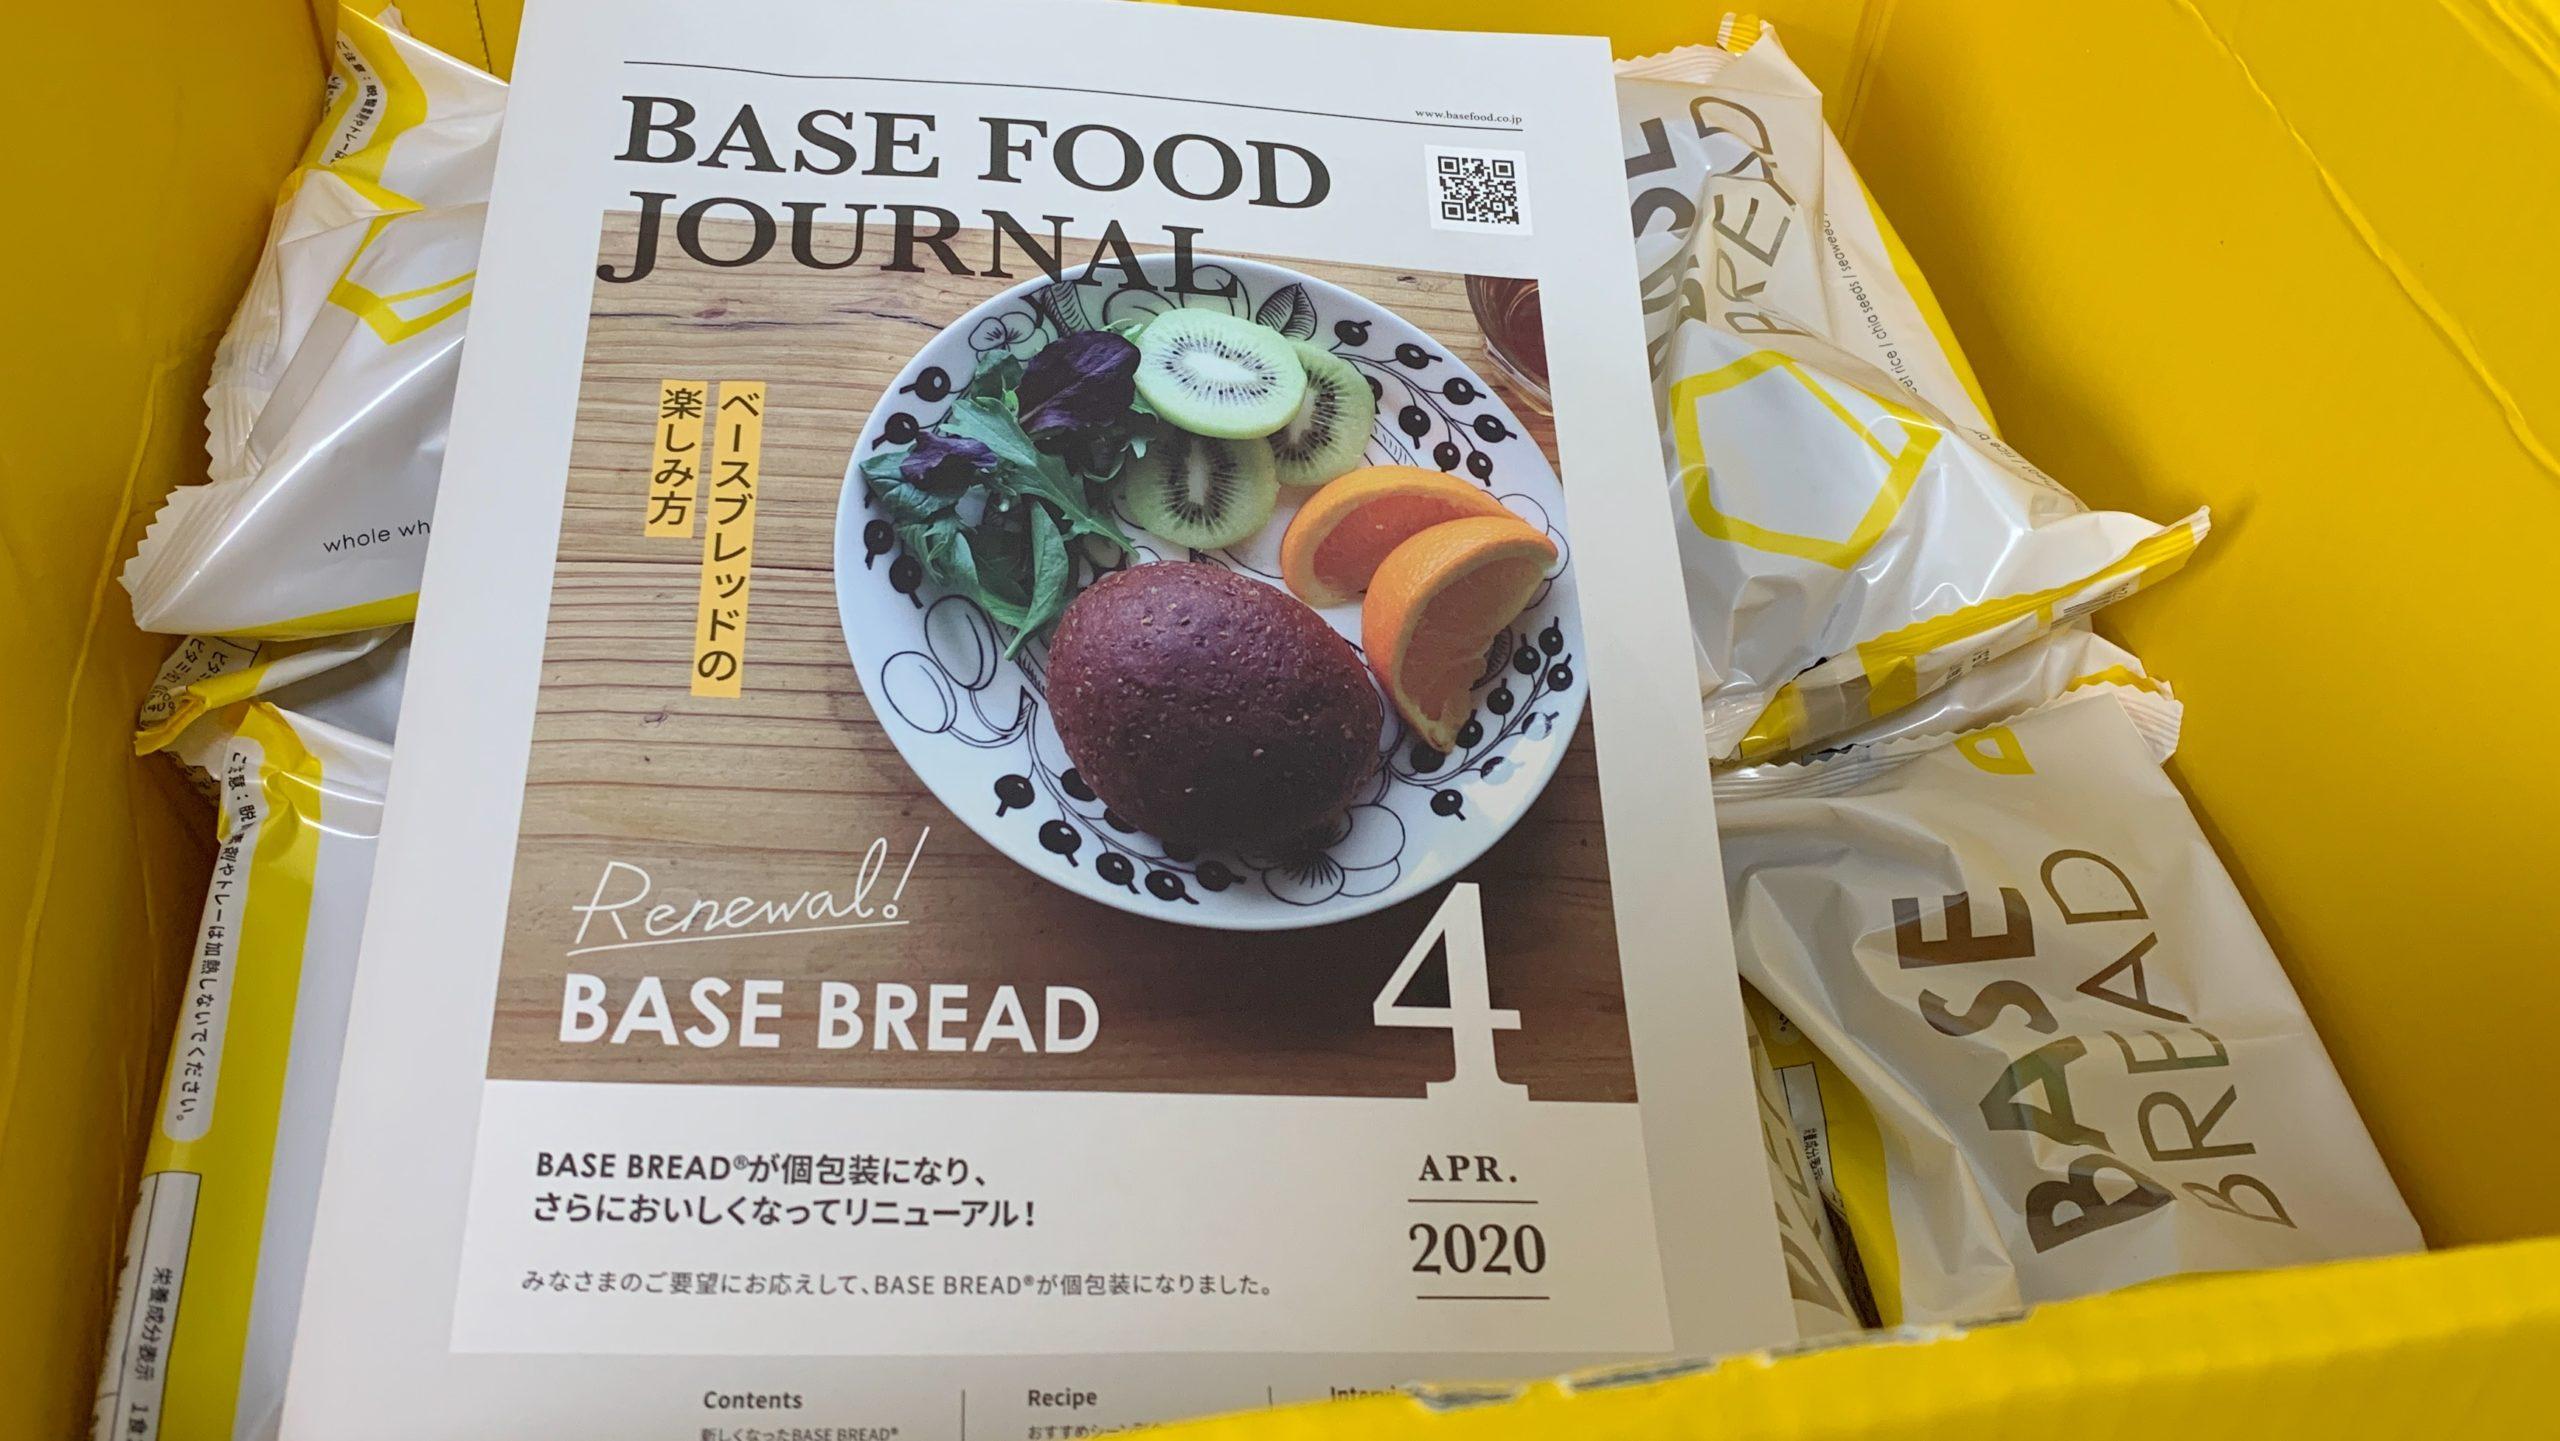 BASE FOOD JOURNAL